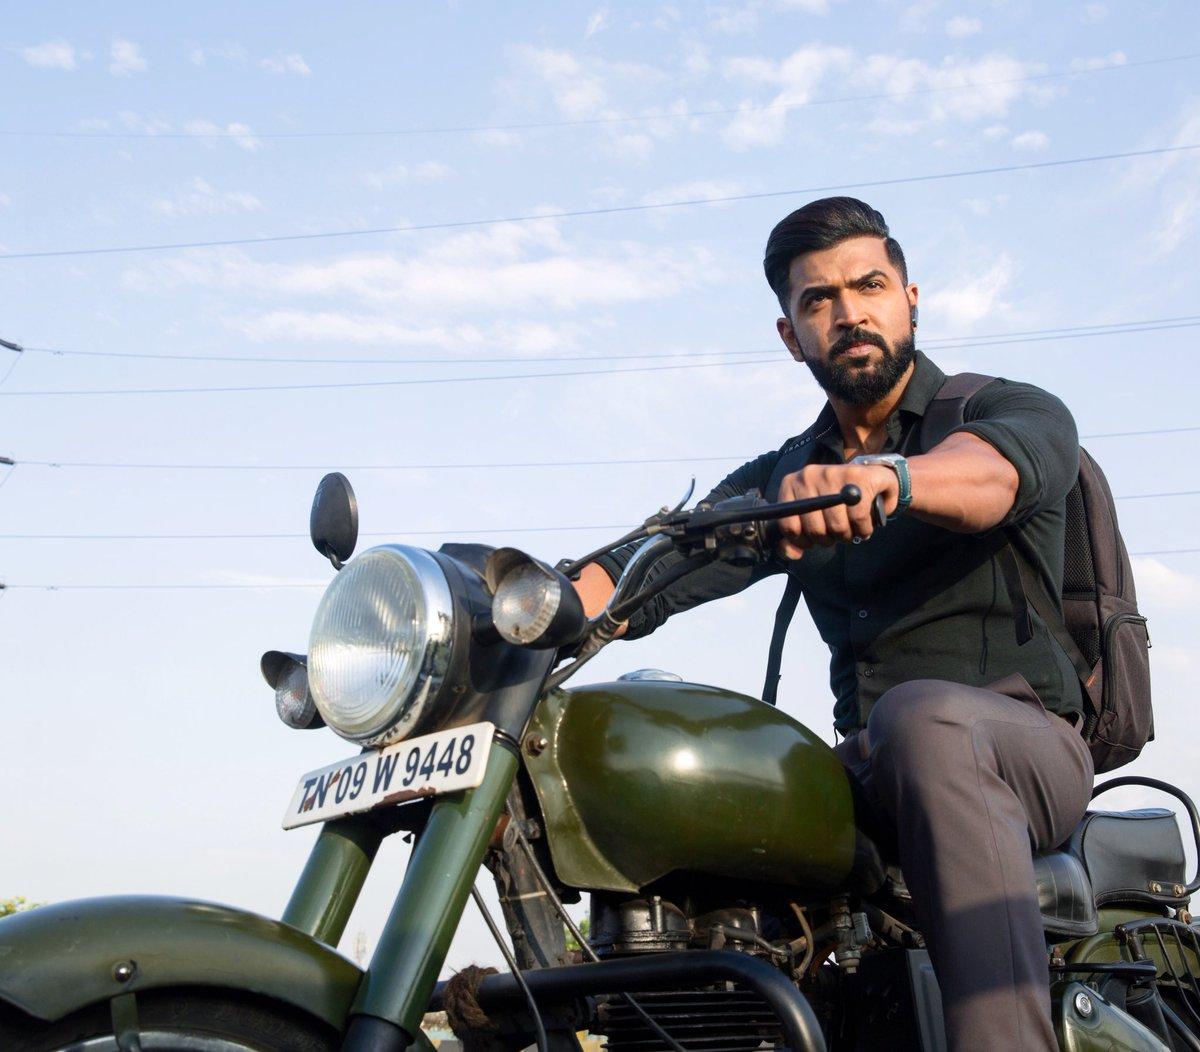 #MafiaFromFeb21st 💥🤞 @karthicknaren_M @LycaProductions @Prasanna_actor @priya_Bshankar @Lyricist_Vivek @JxBe